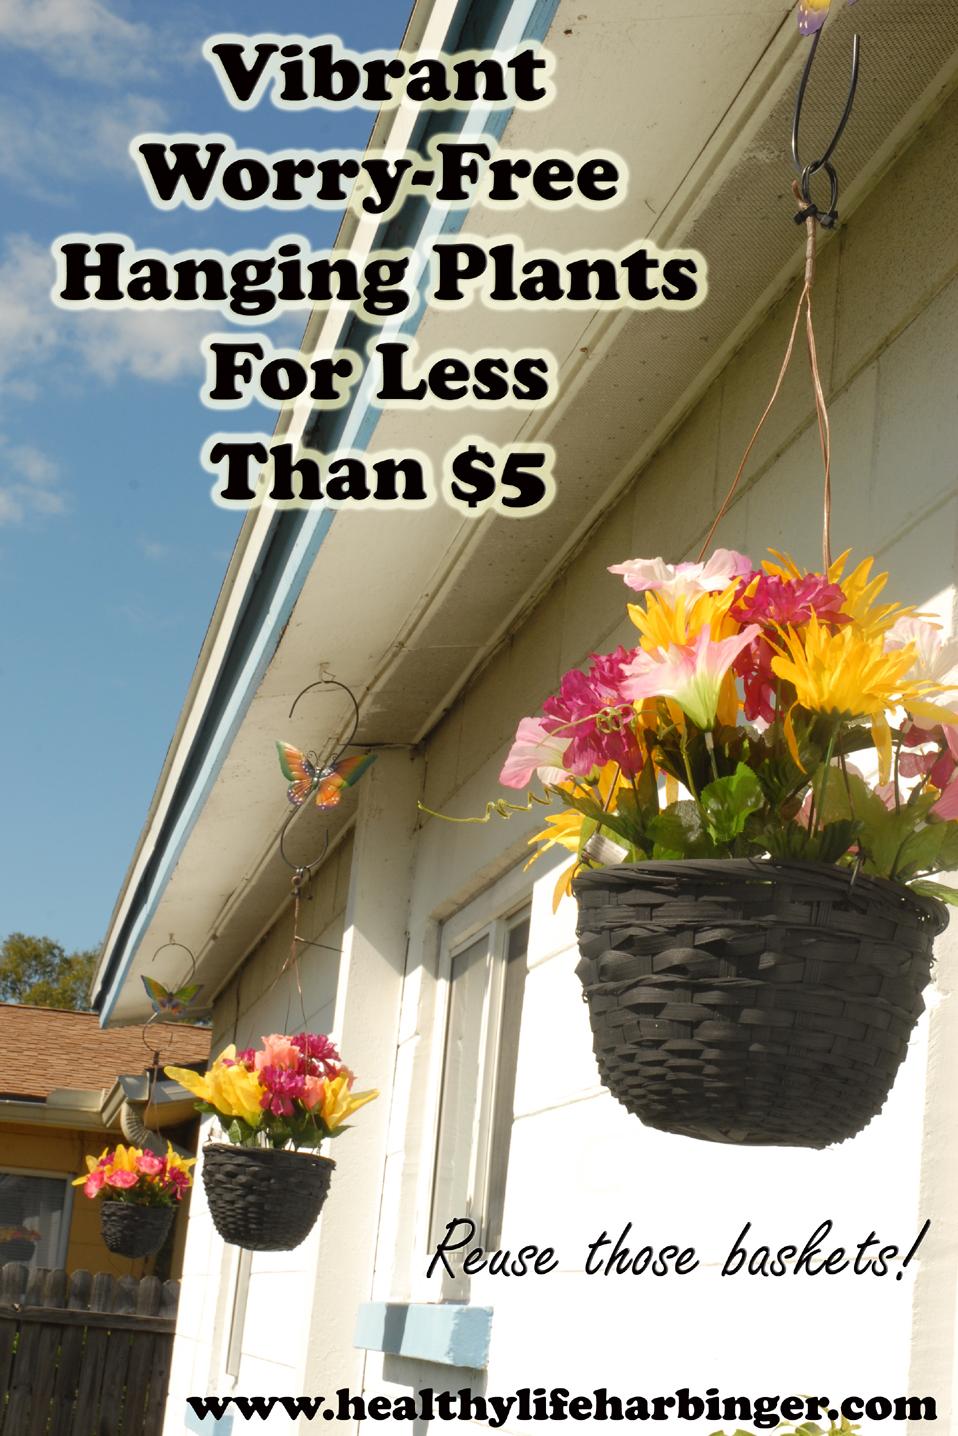 Silk Flowers Healthy Life Harbinger